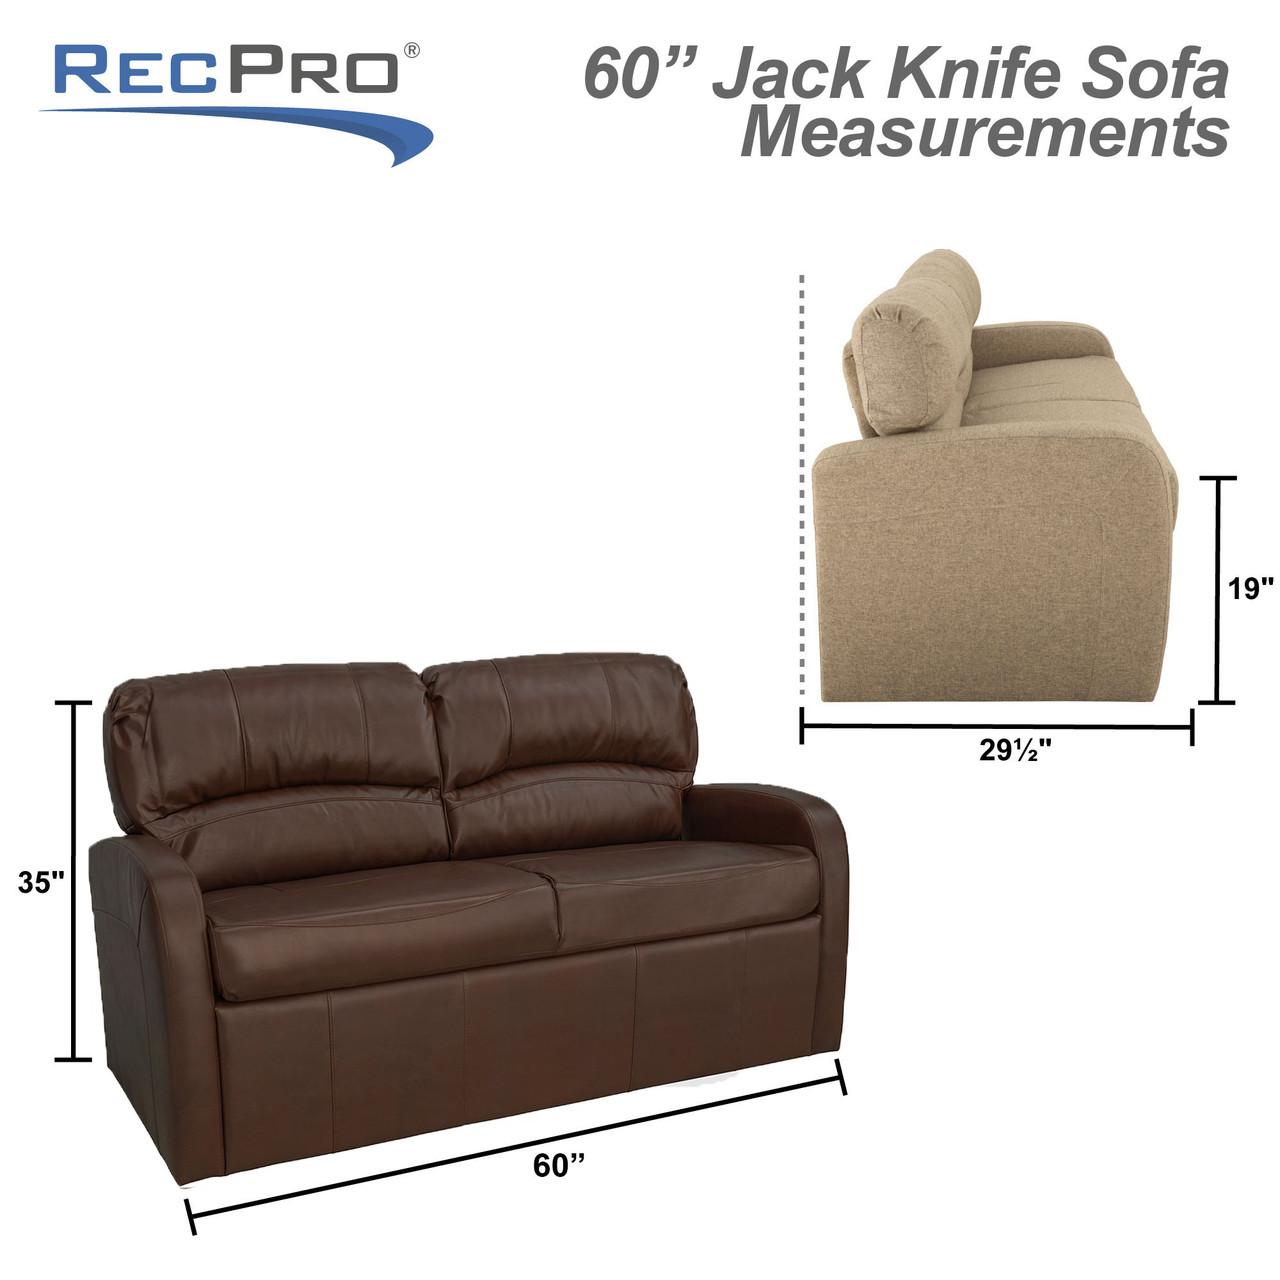 Recpro Charles 60 Rv Jackknife Sleeper Sofa Recpro